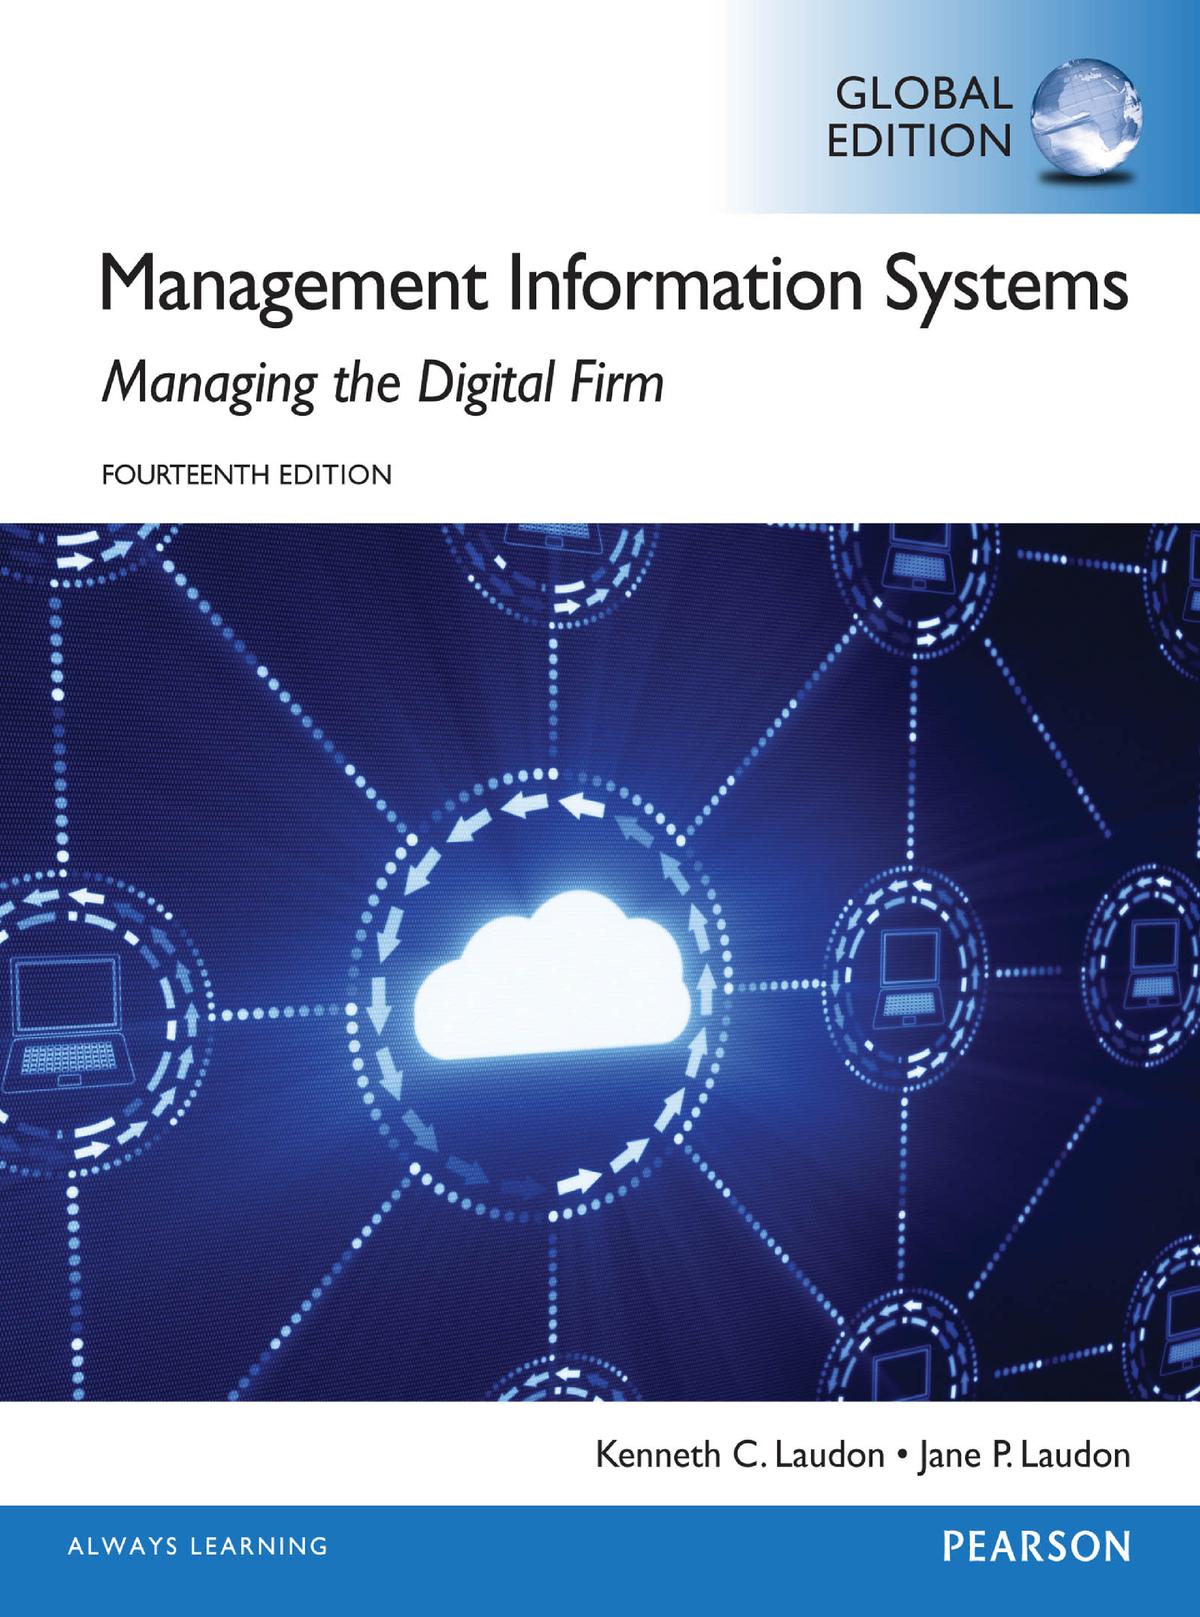 managing the digital firm - StuDocu